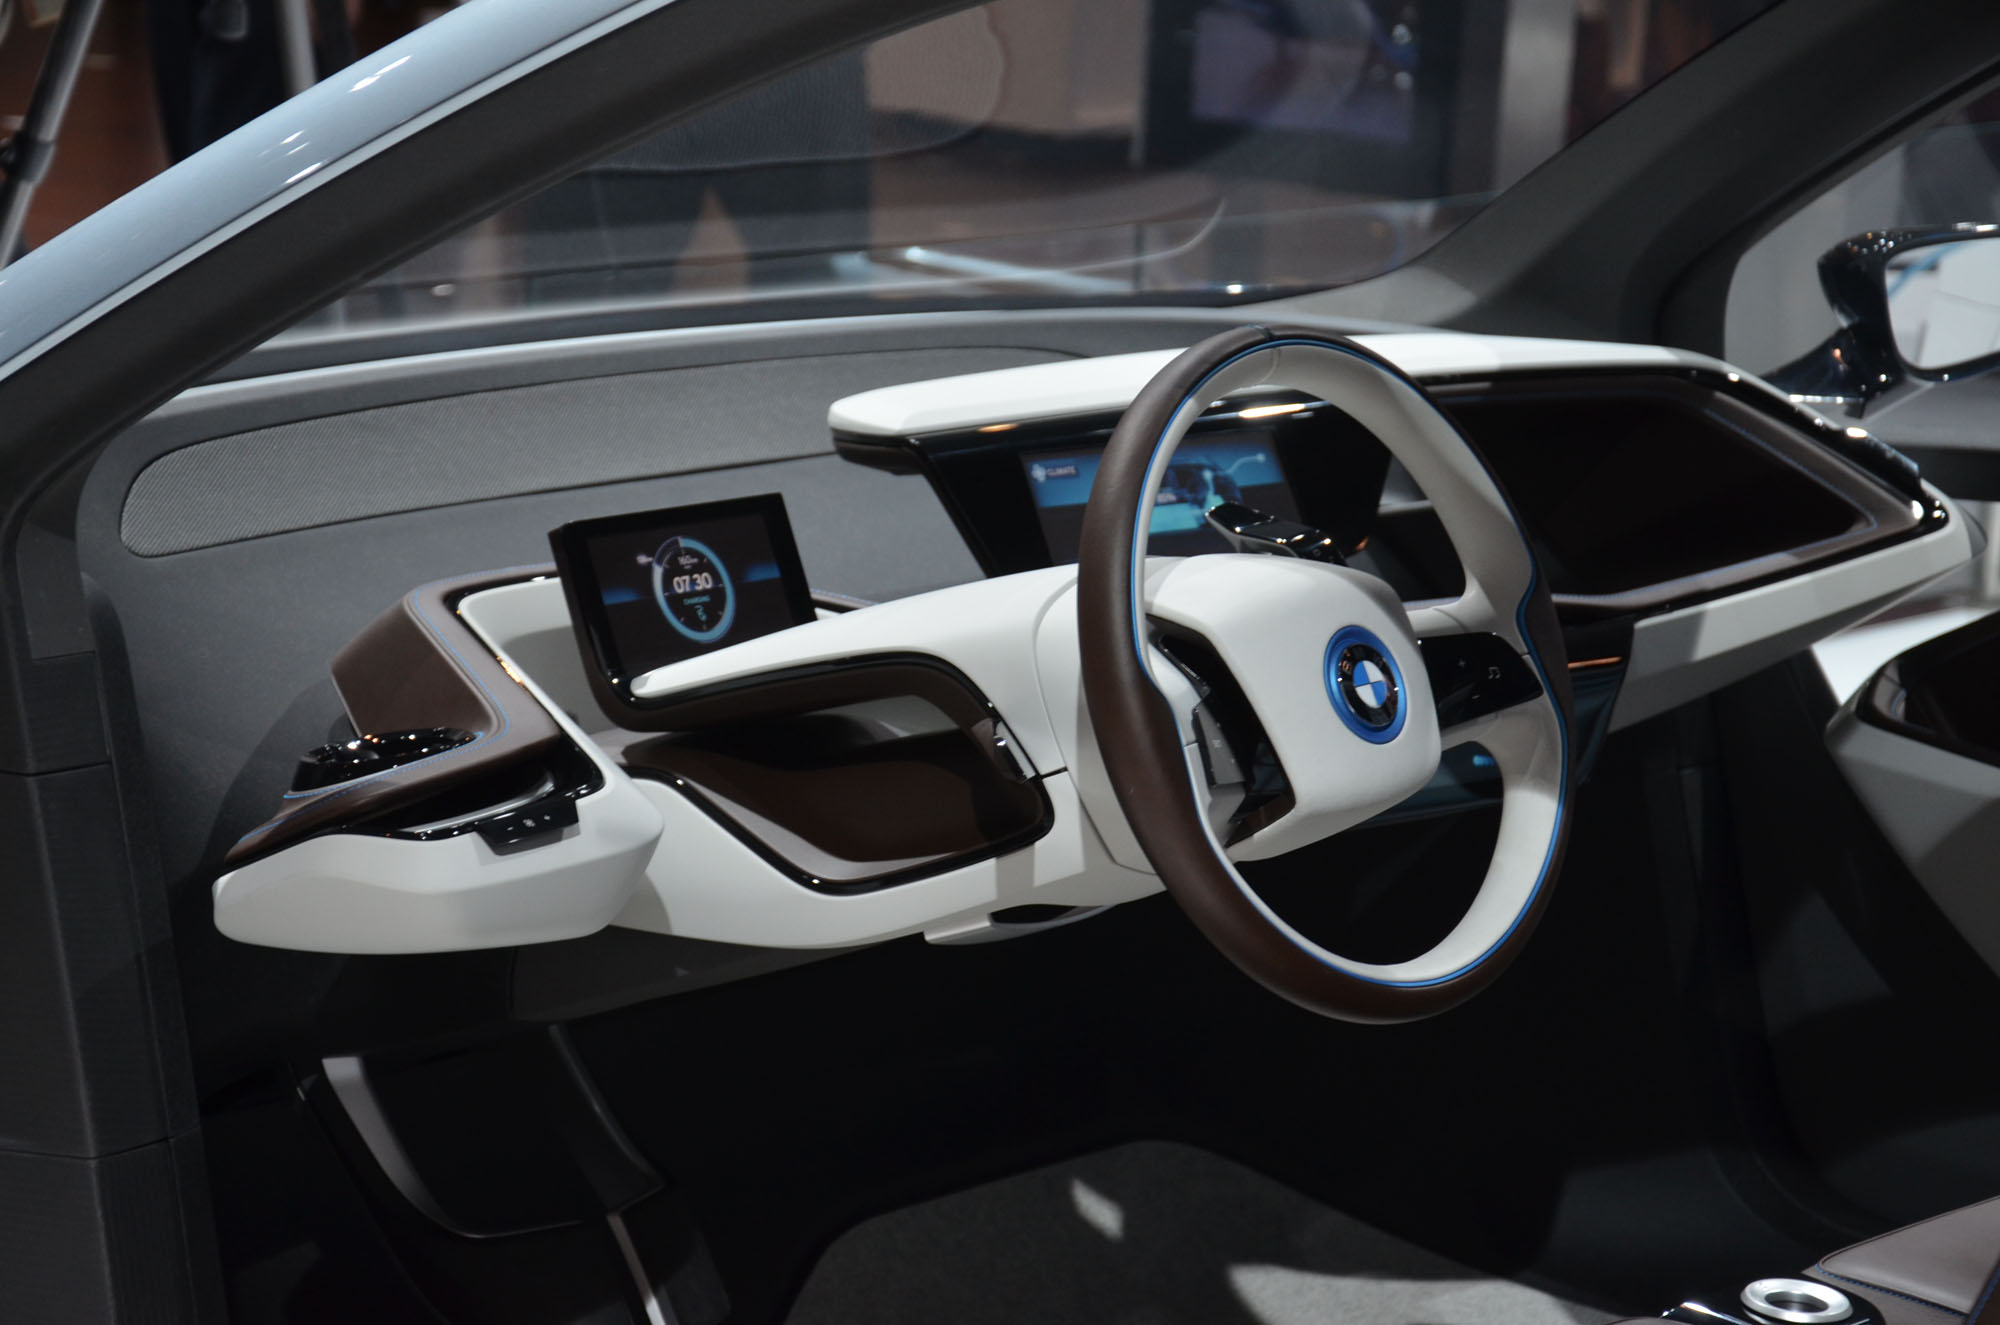 3D Car Design Software